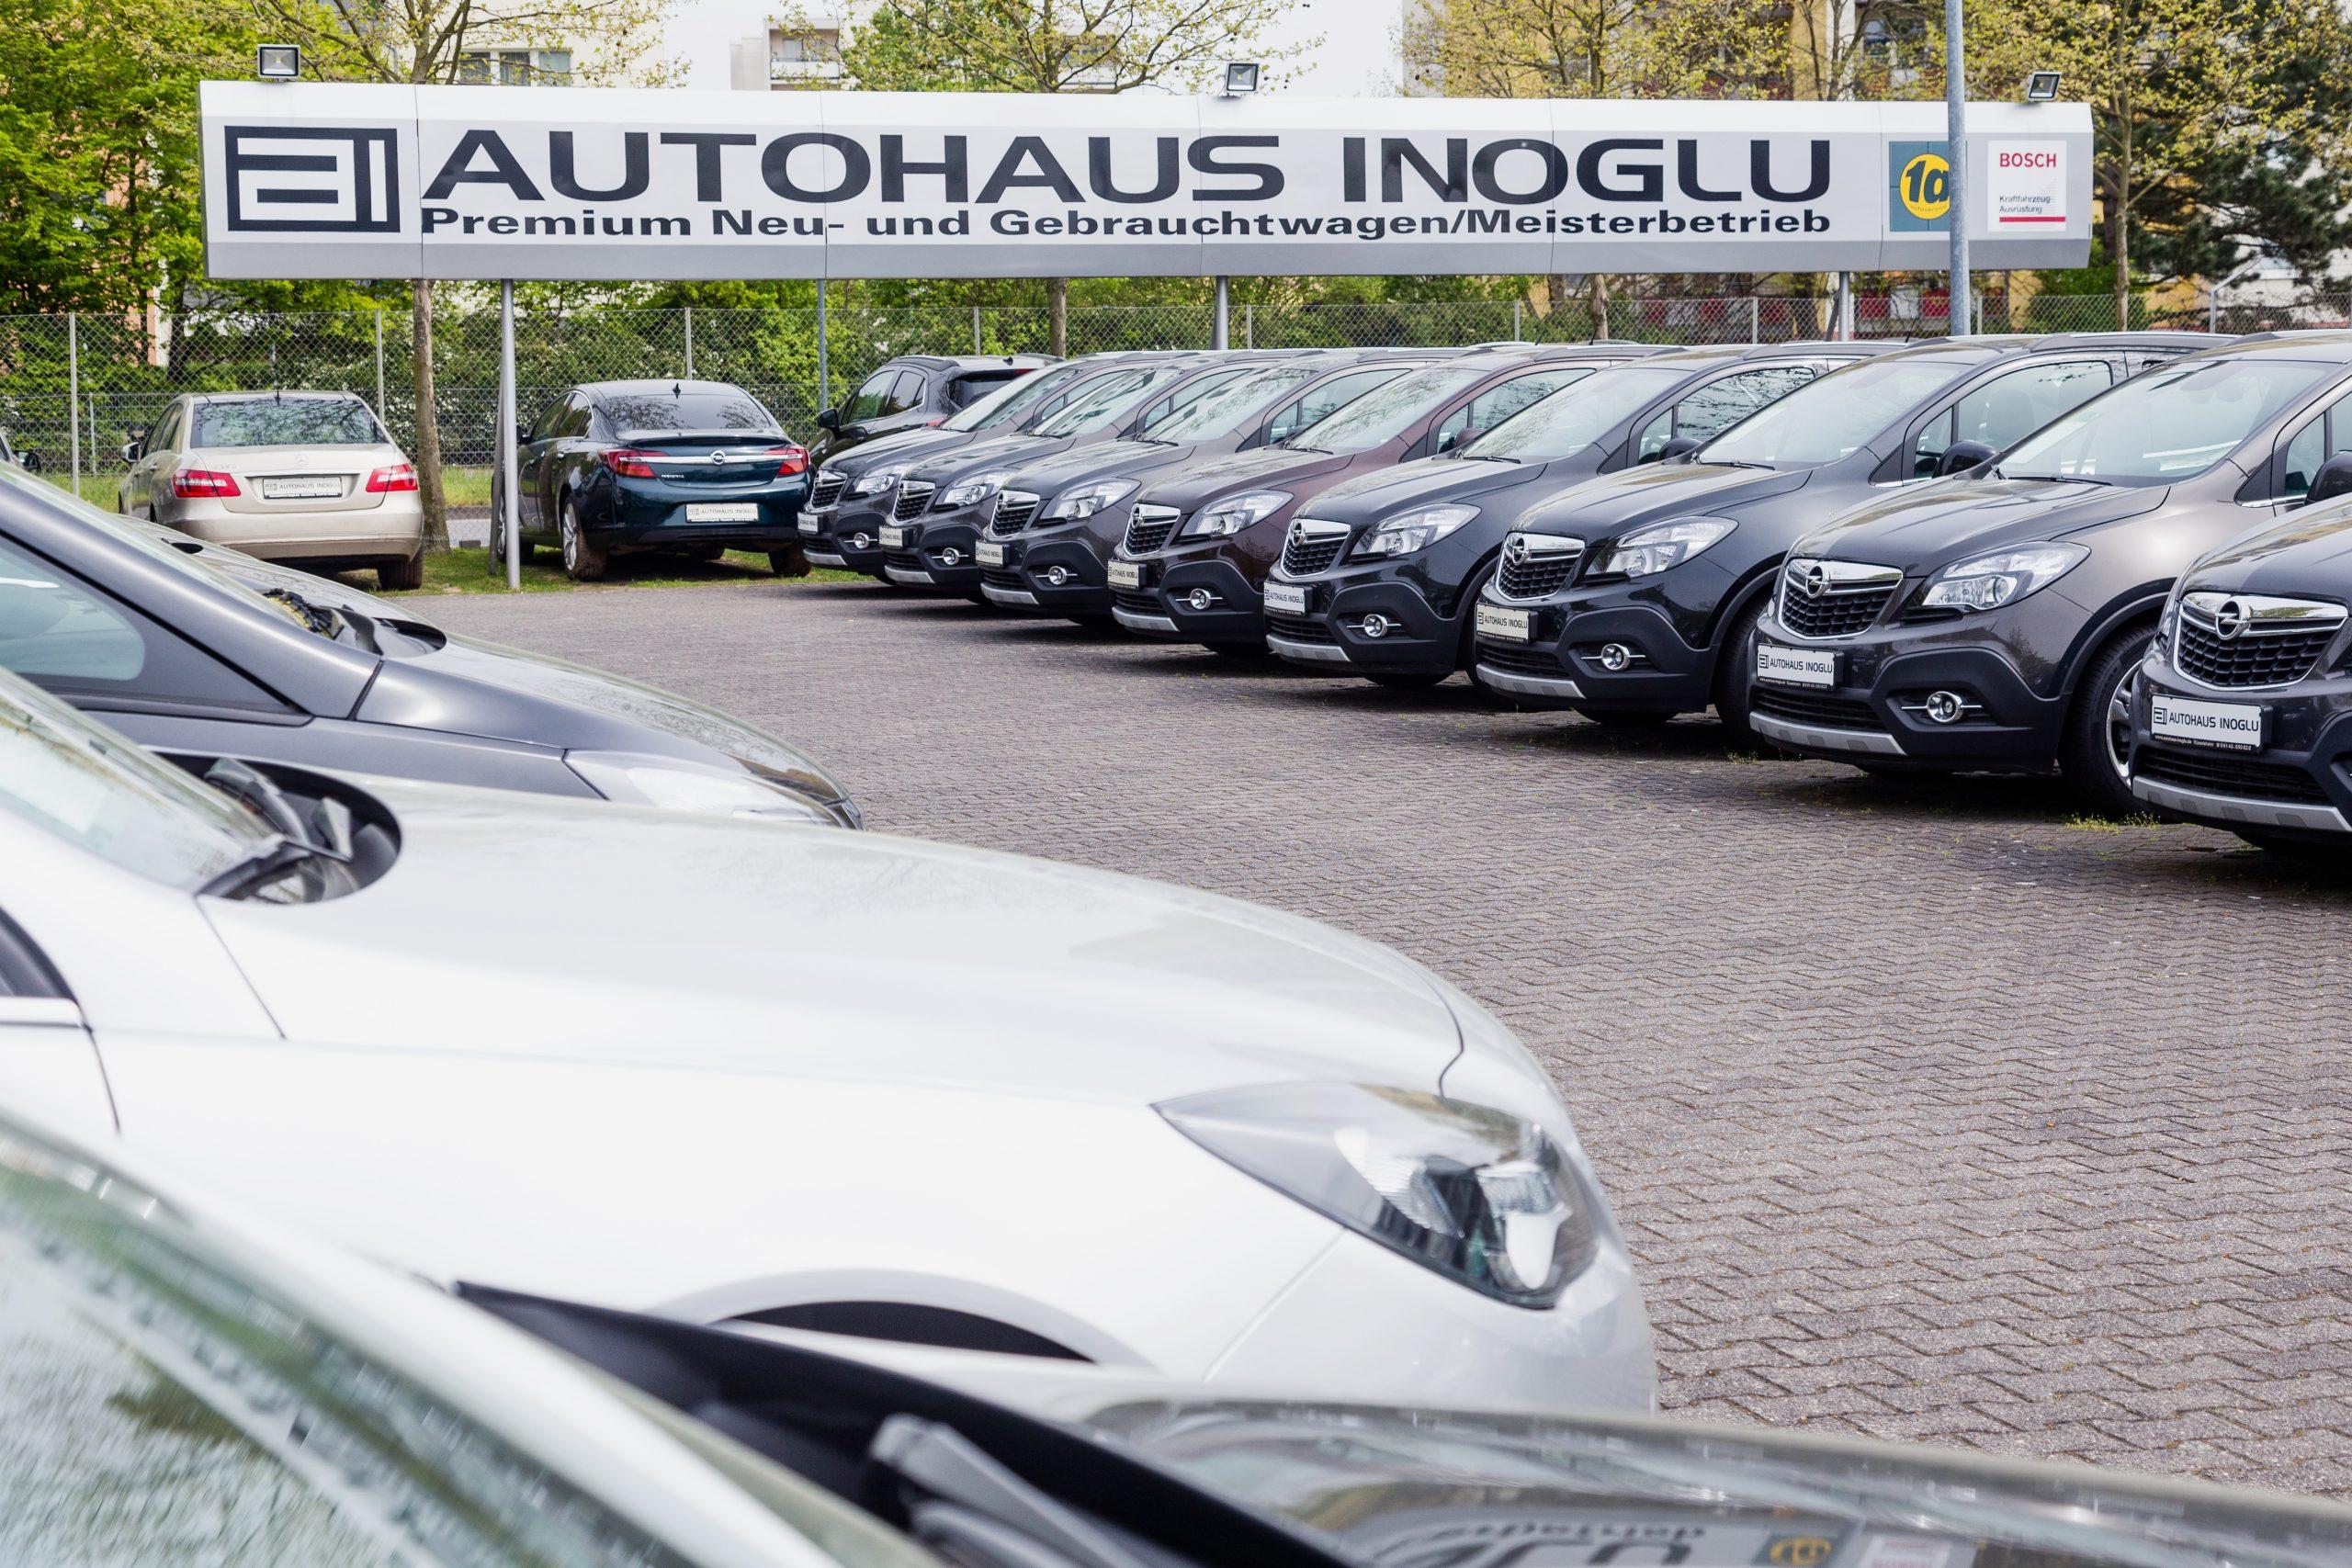 Autohaus Inoglu - 007